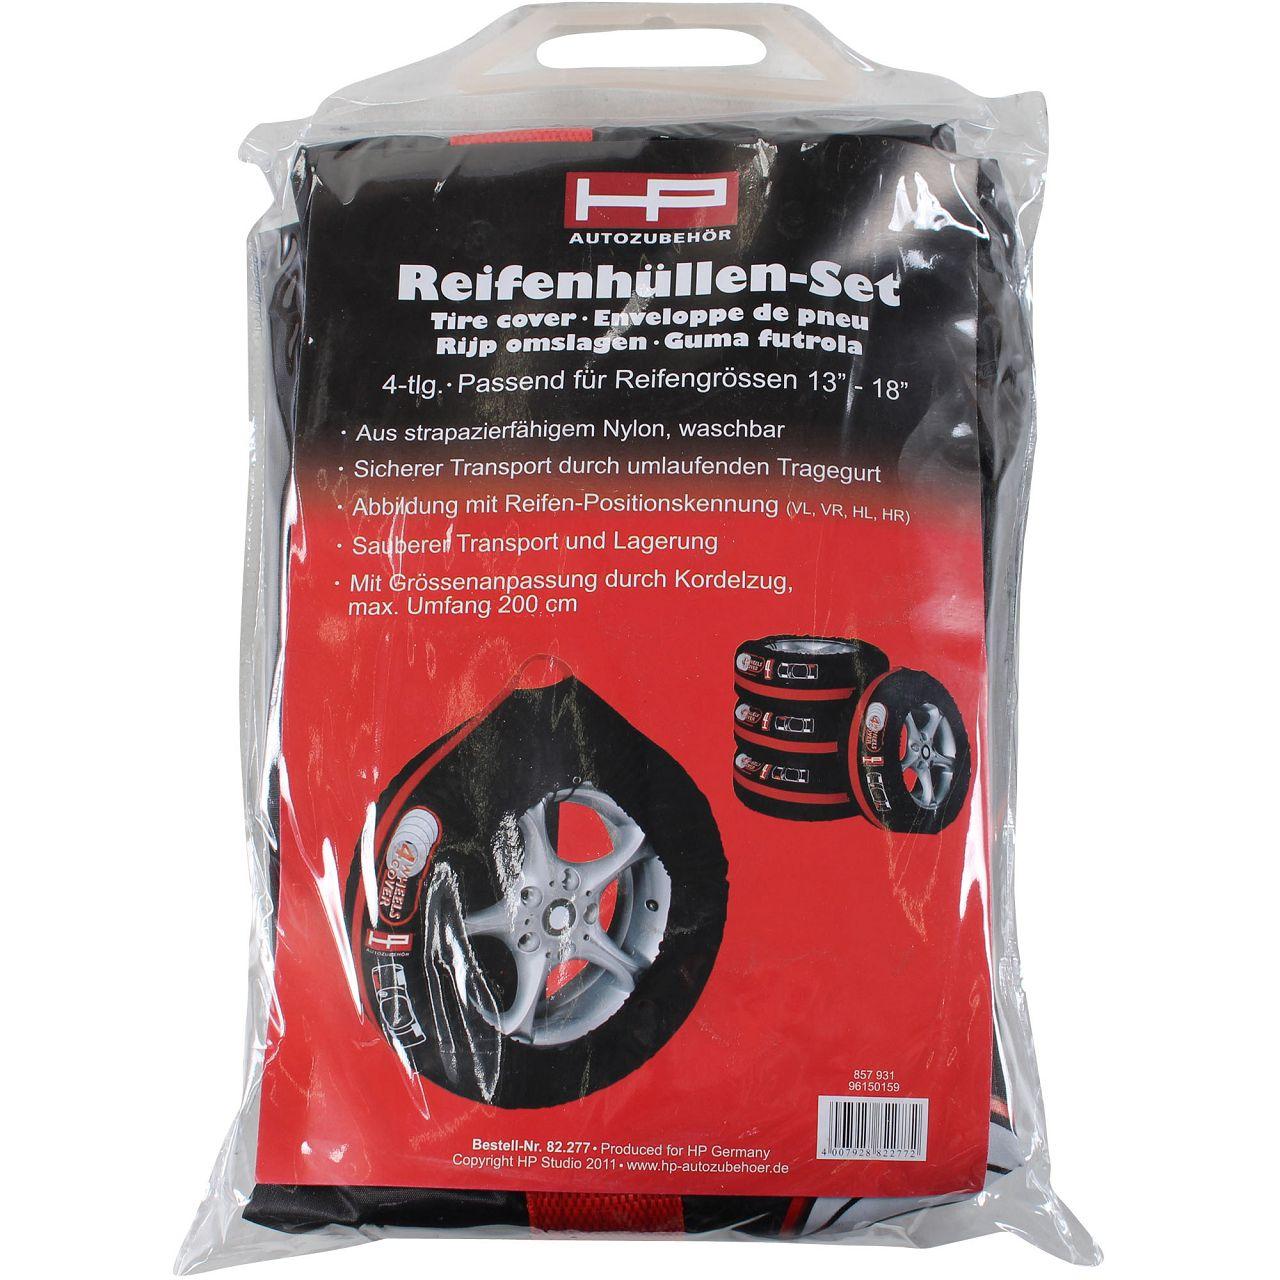 HP Reifenhüllensatz Reifentaschen Felgentasche 13-18 Zoll